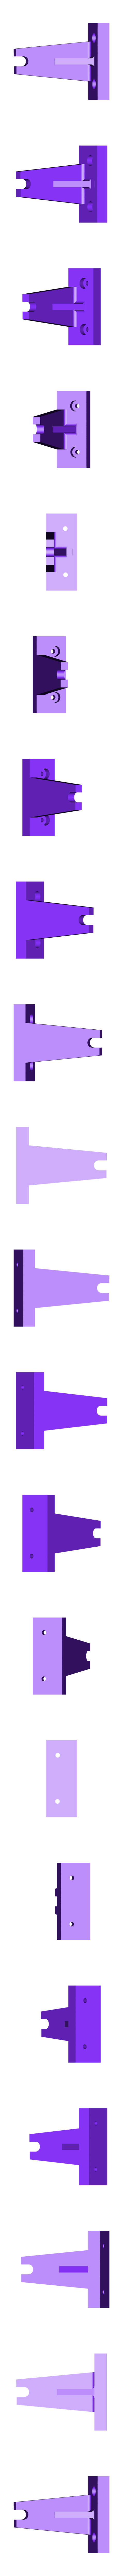 Rotate-Tool02.stl Download free STL file Rotational Stand for Turboprop Engine Cutaway • 3D printer template, konchan77